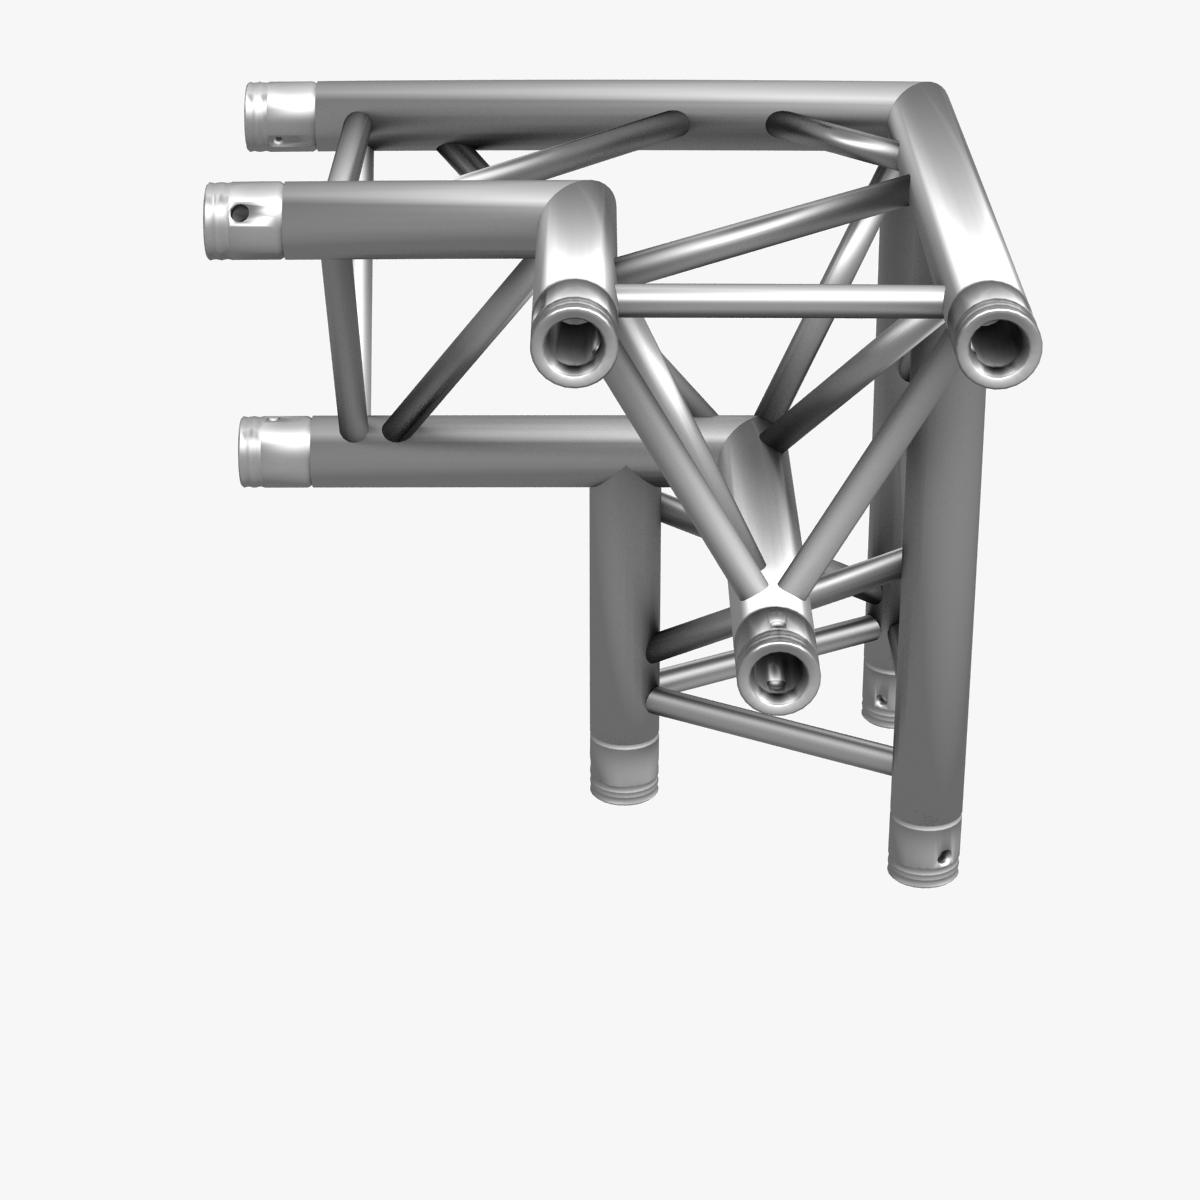 triangular trusses (collection 55 modular pieces) 3d model 3ds max dxf fbx c4d dae texture obj 216239